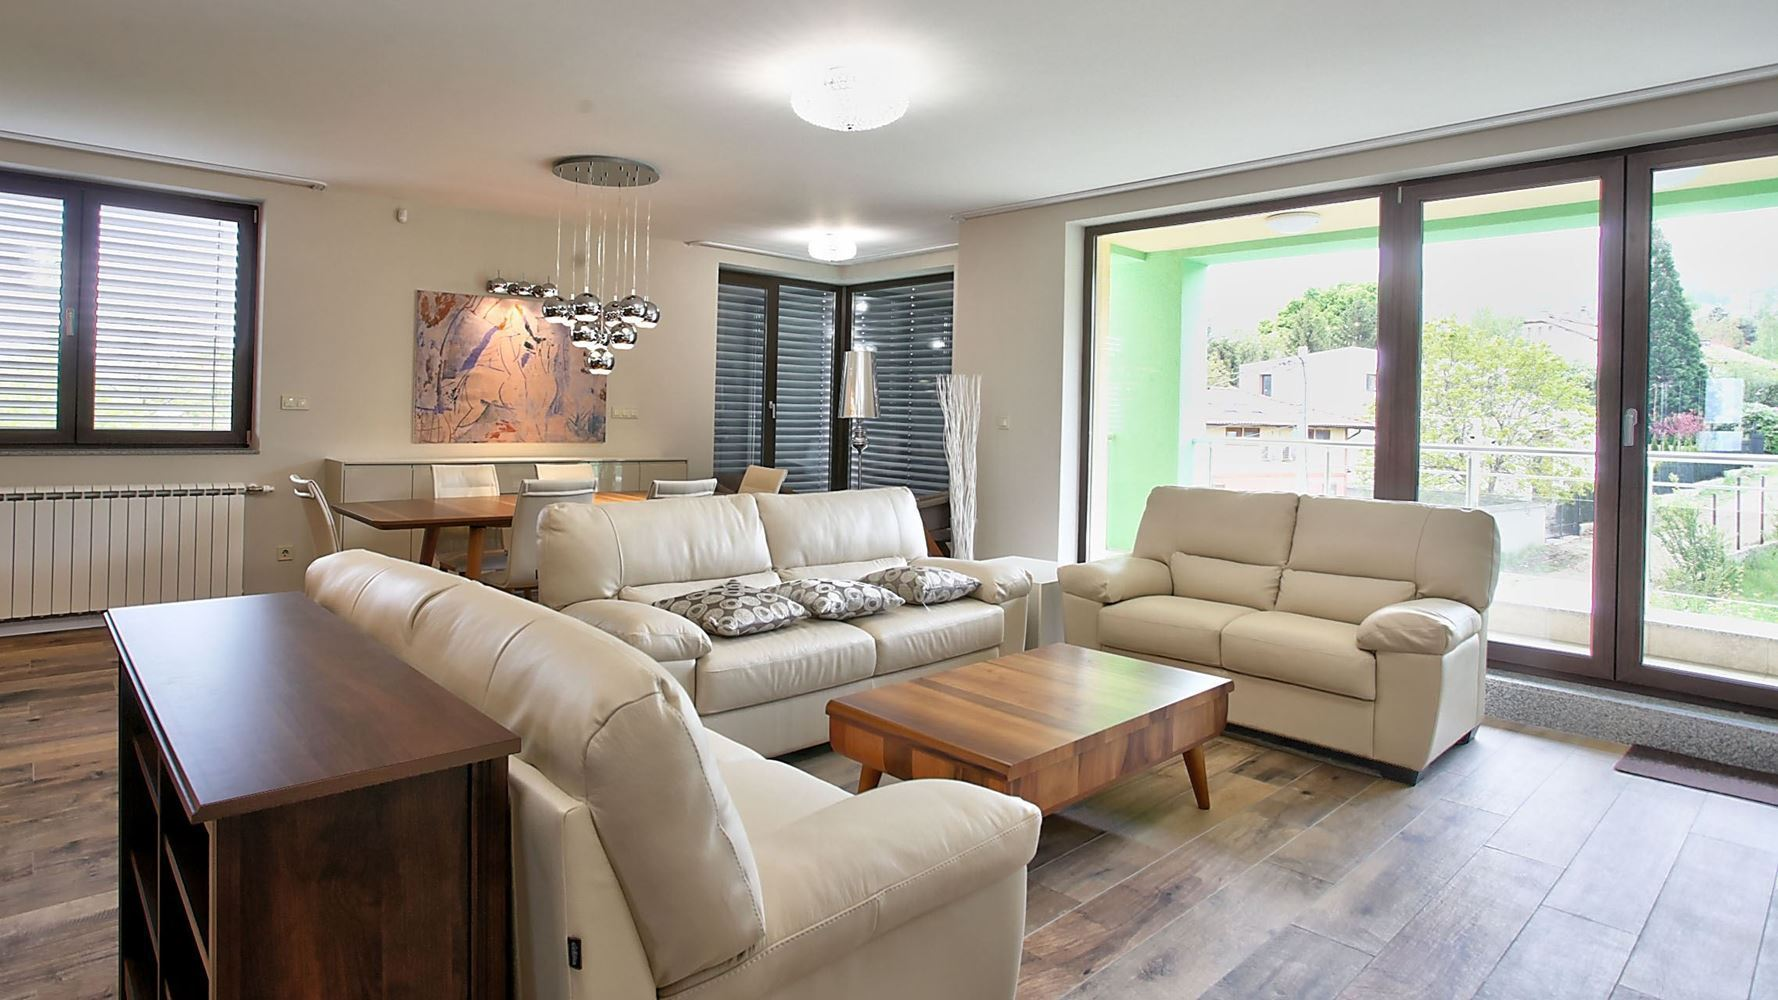 3-bedroom Apartment for Rent, Simeonovo